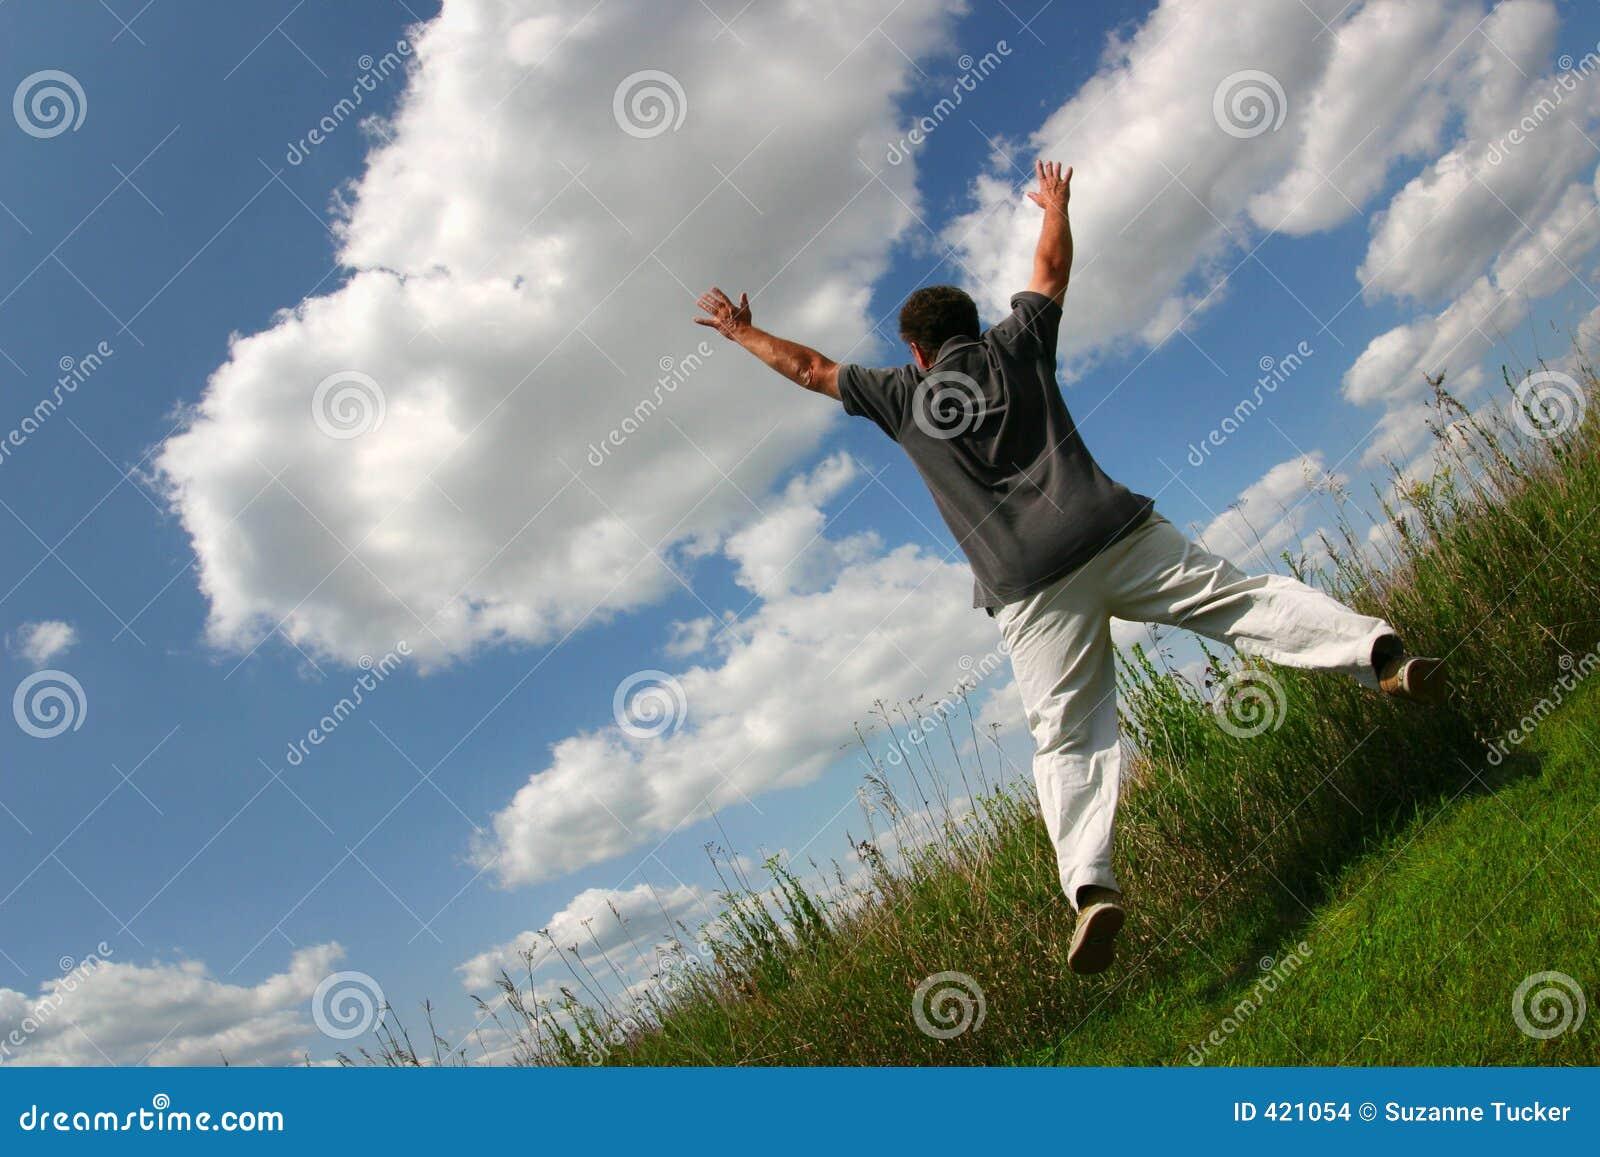 Sprong voor vreugde